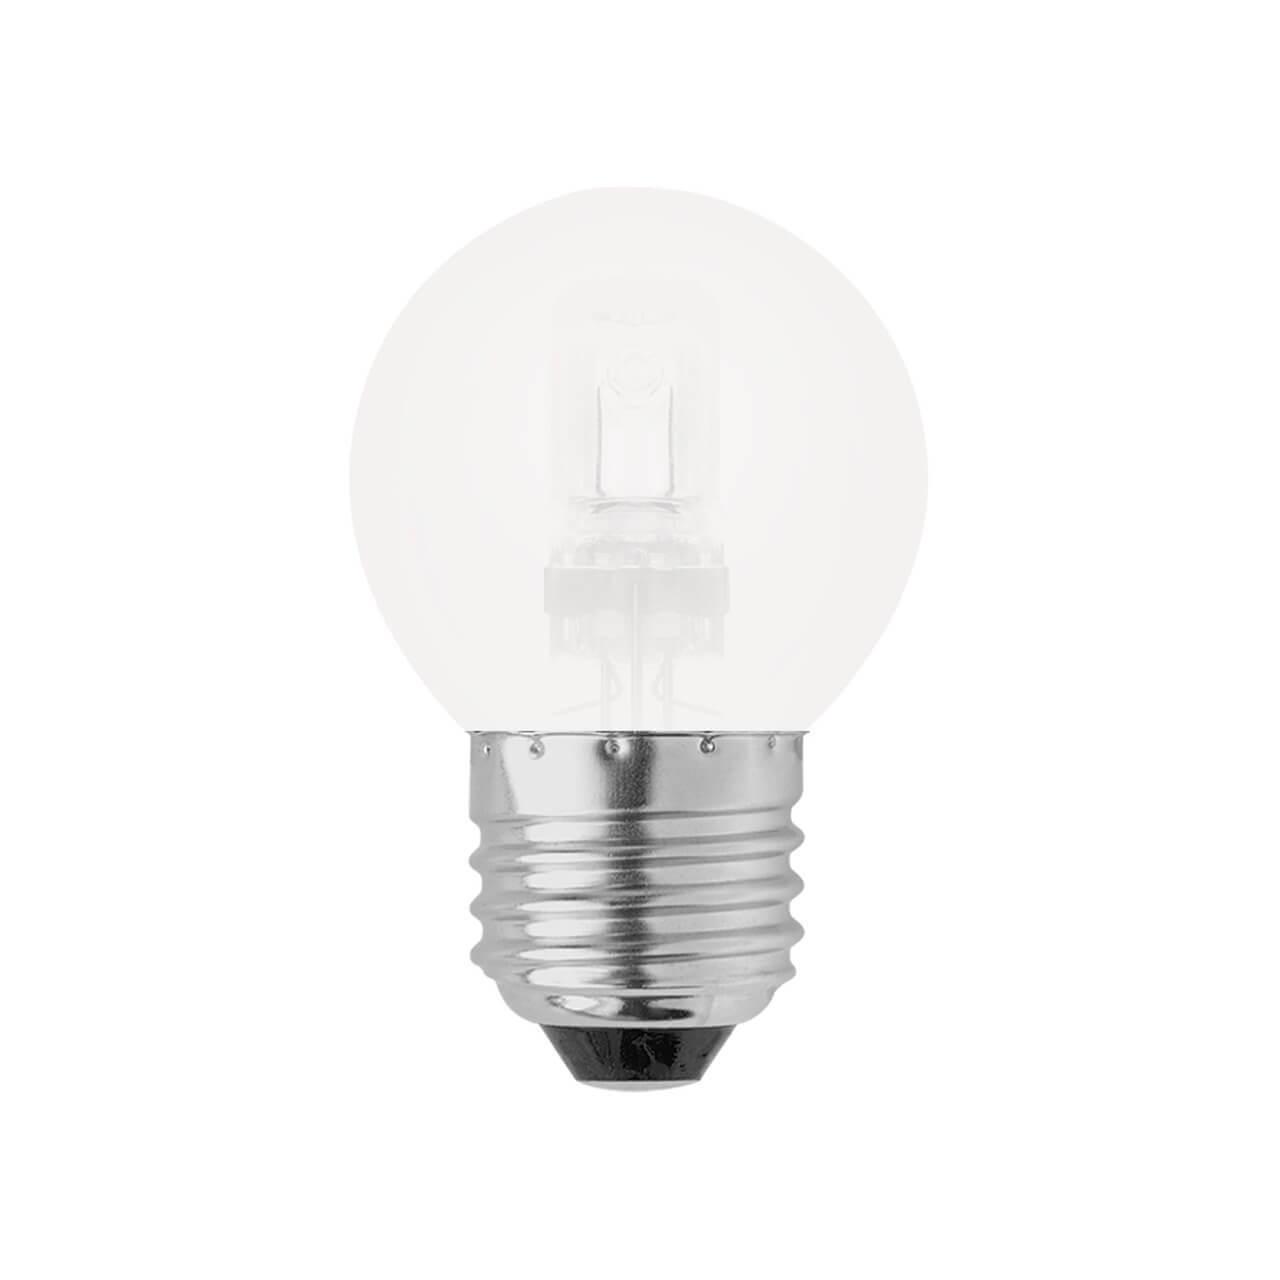 Лампа галогенная (05221) Uniel E27 28W матовая HCL-28/FR/E27 Globe лампа галогенная e27 28w прозрачная 4690389020919